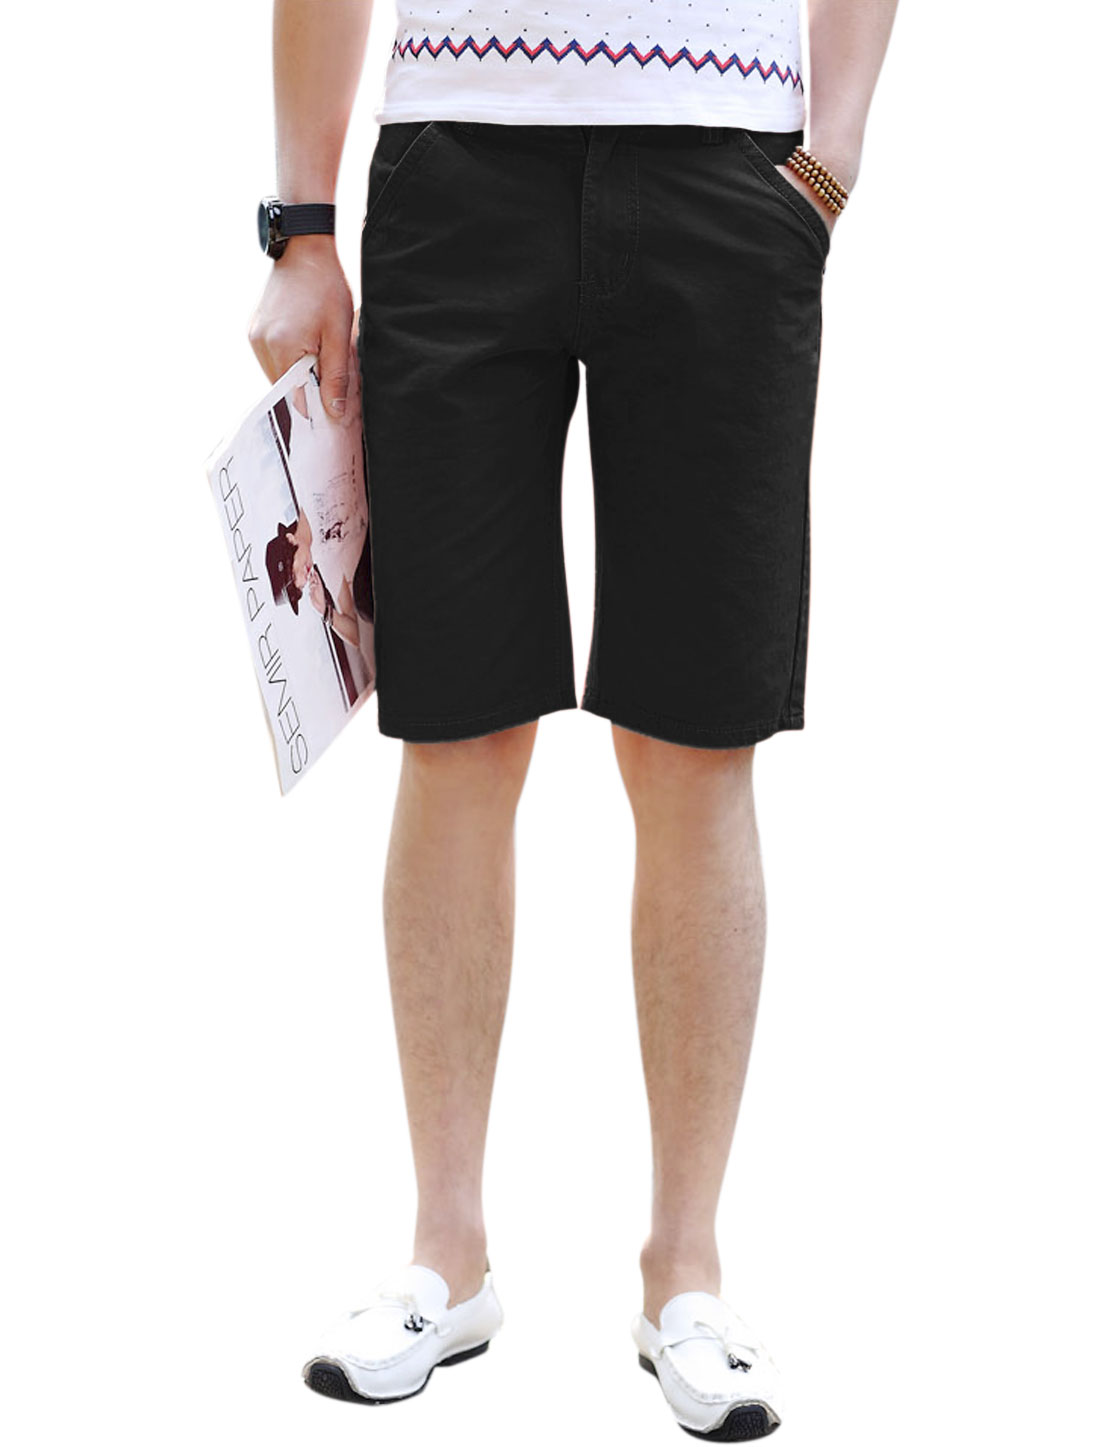 Men Zip Fly Button Closure Straight Summer Short Shorts Black W34